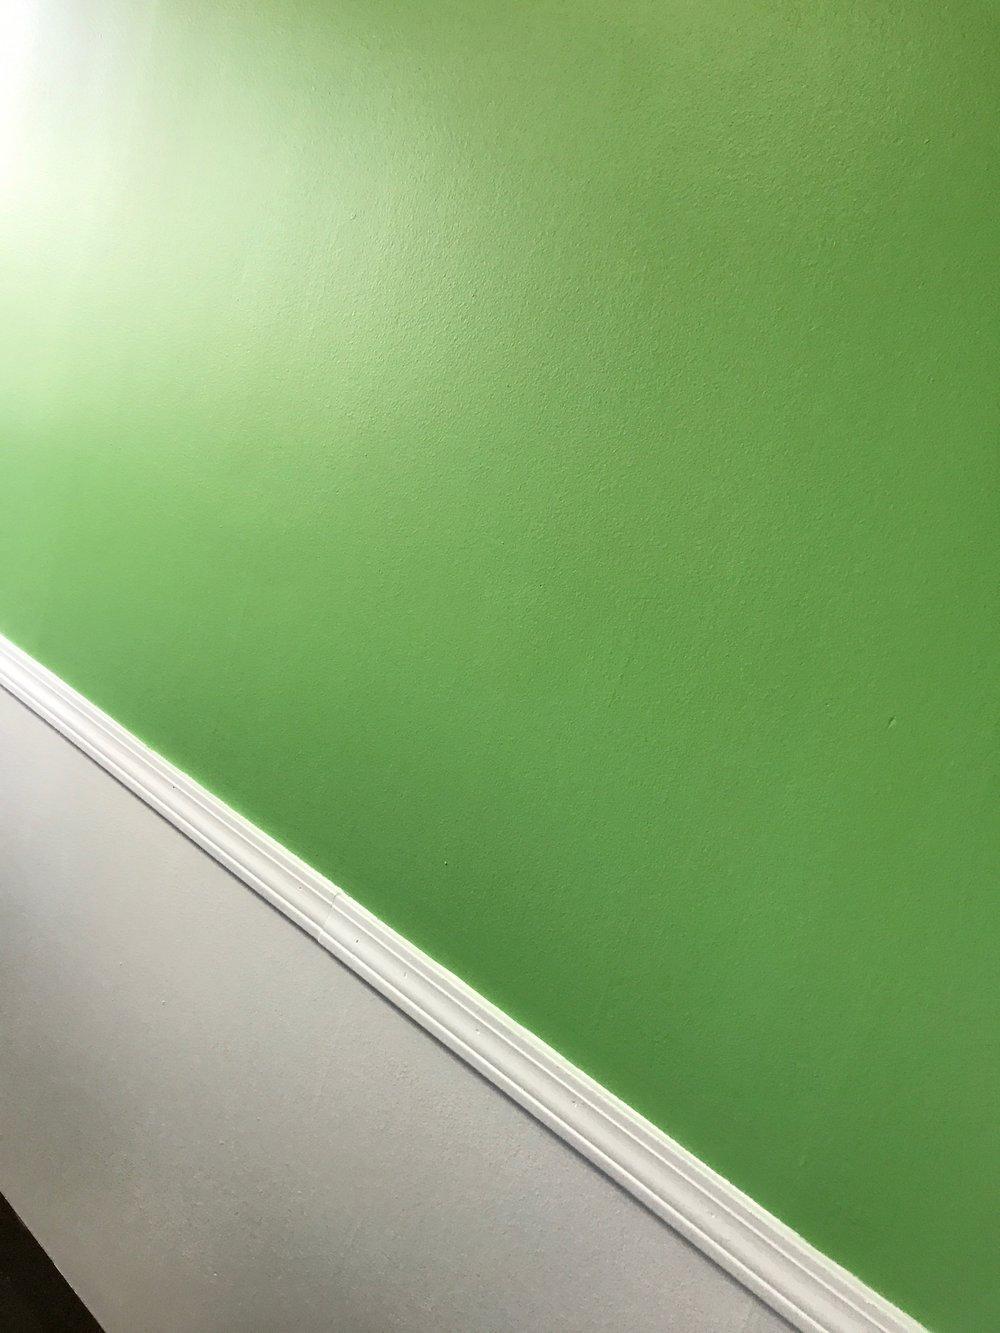 Daring Green for Parma Housing